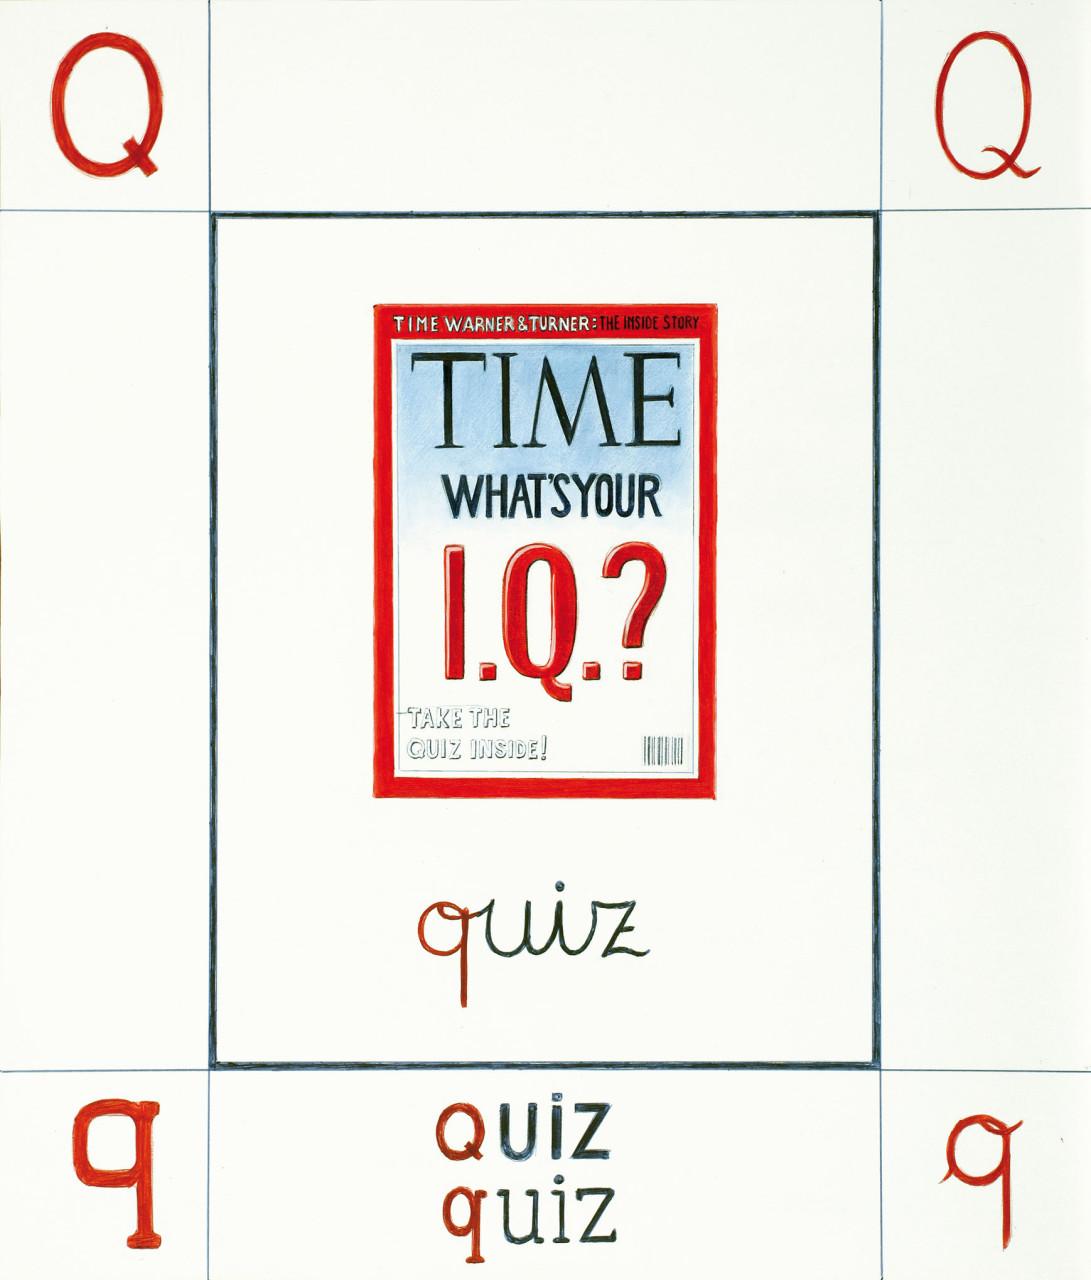 17Q-quiz_bassa